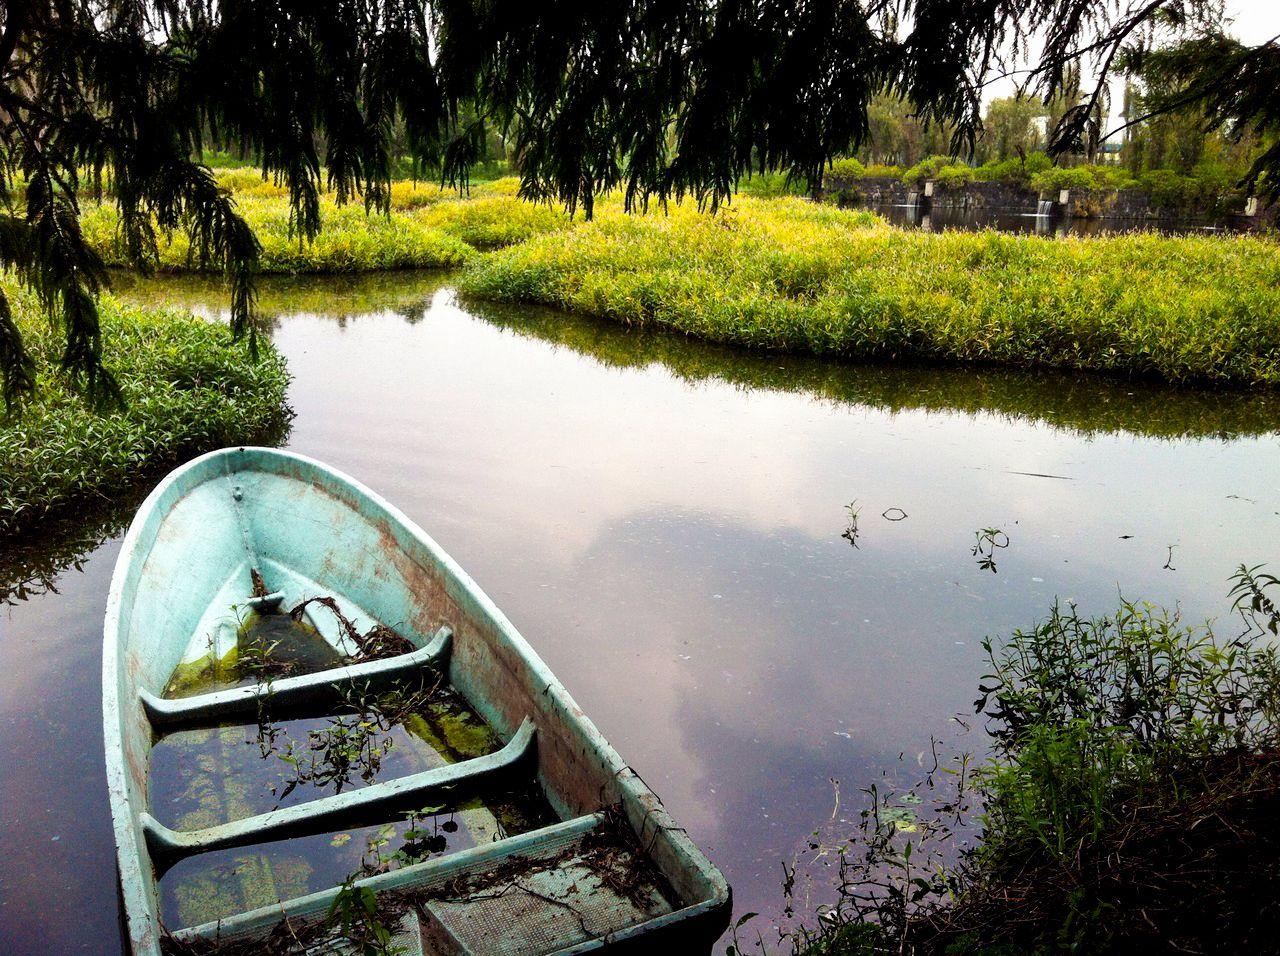 Parque, ecologico, xochimilco, verde, Park, ecological, green, bote, abandonado, lago, agua, boat, abandoned, lake, water